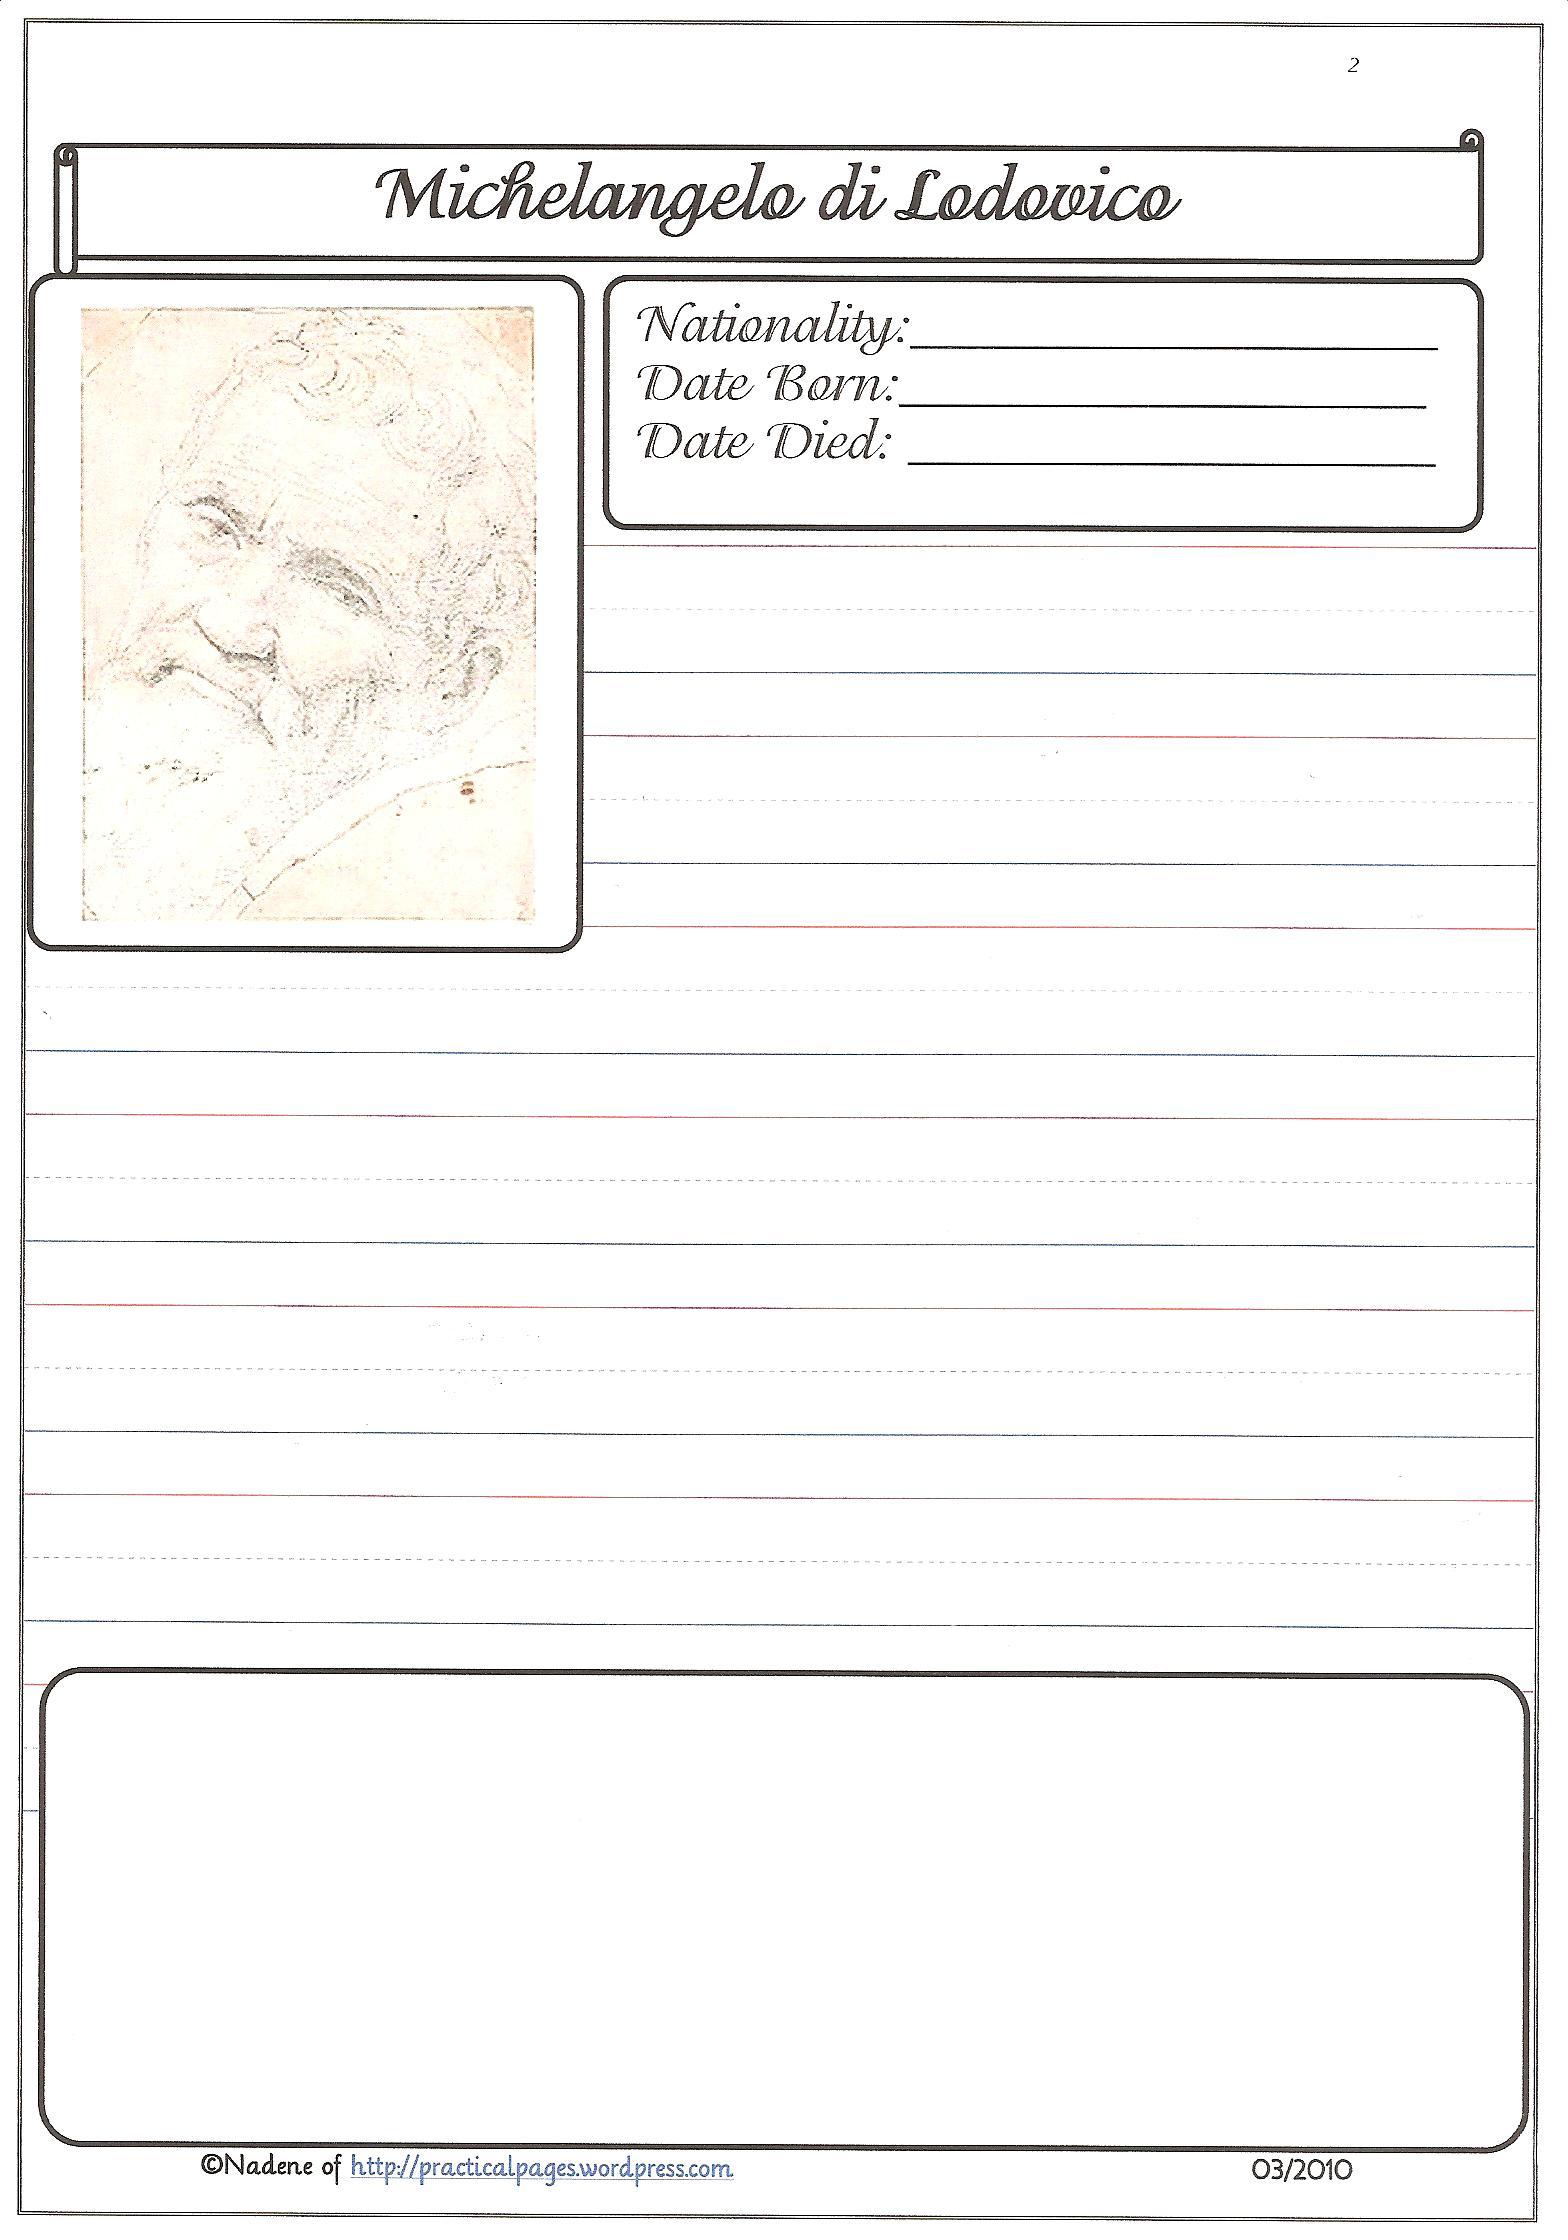 Picasso Portrait Worksheet